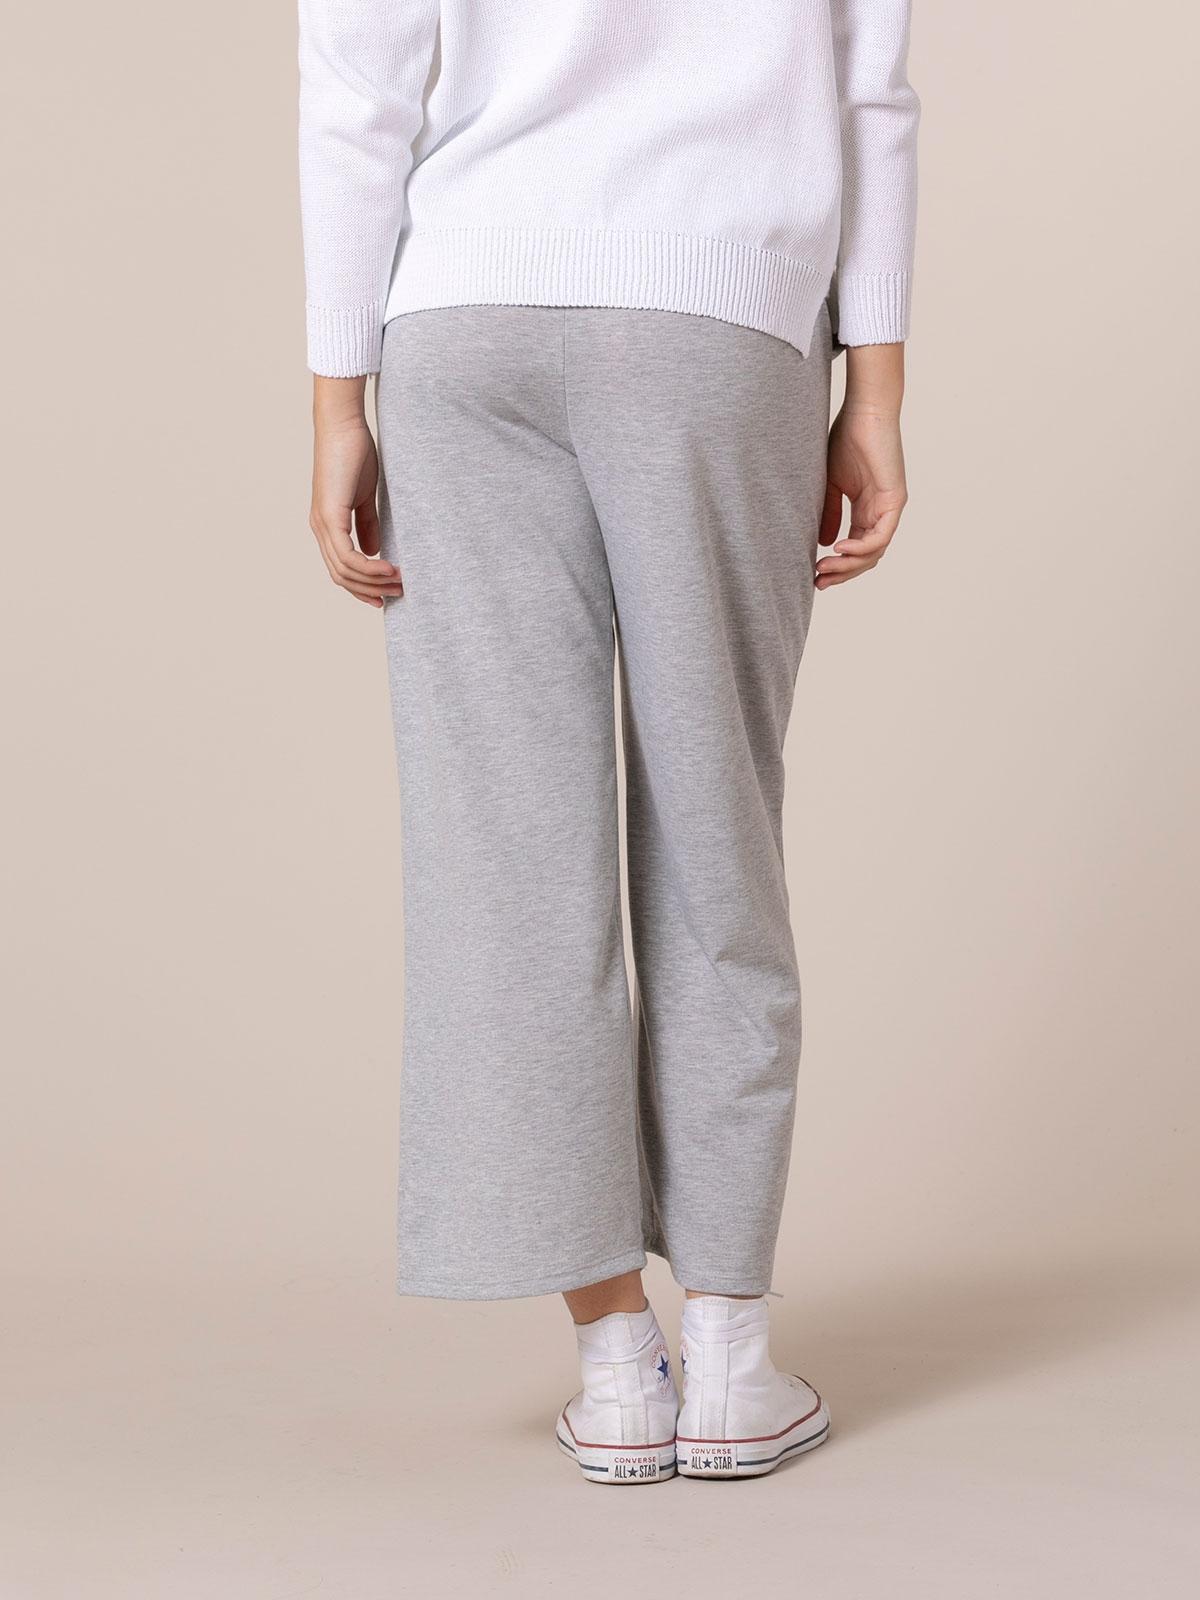 Pantalón mujer culotte algodón Gris